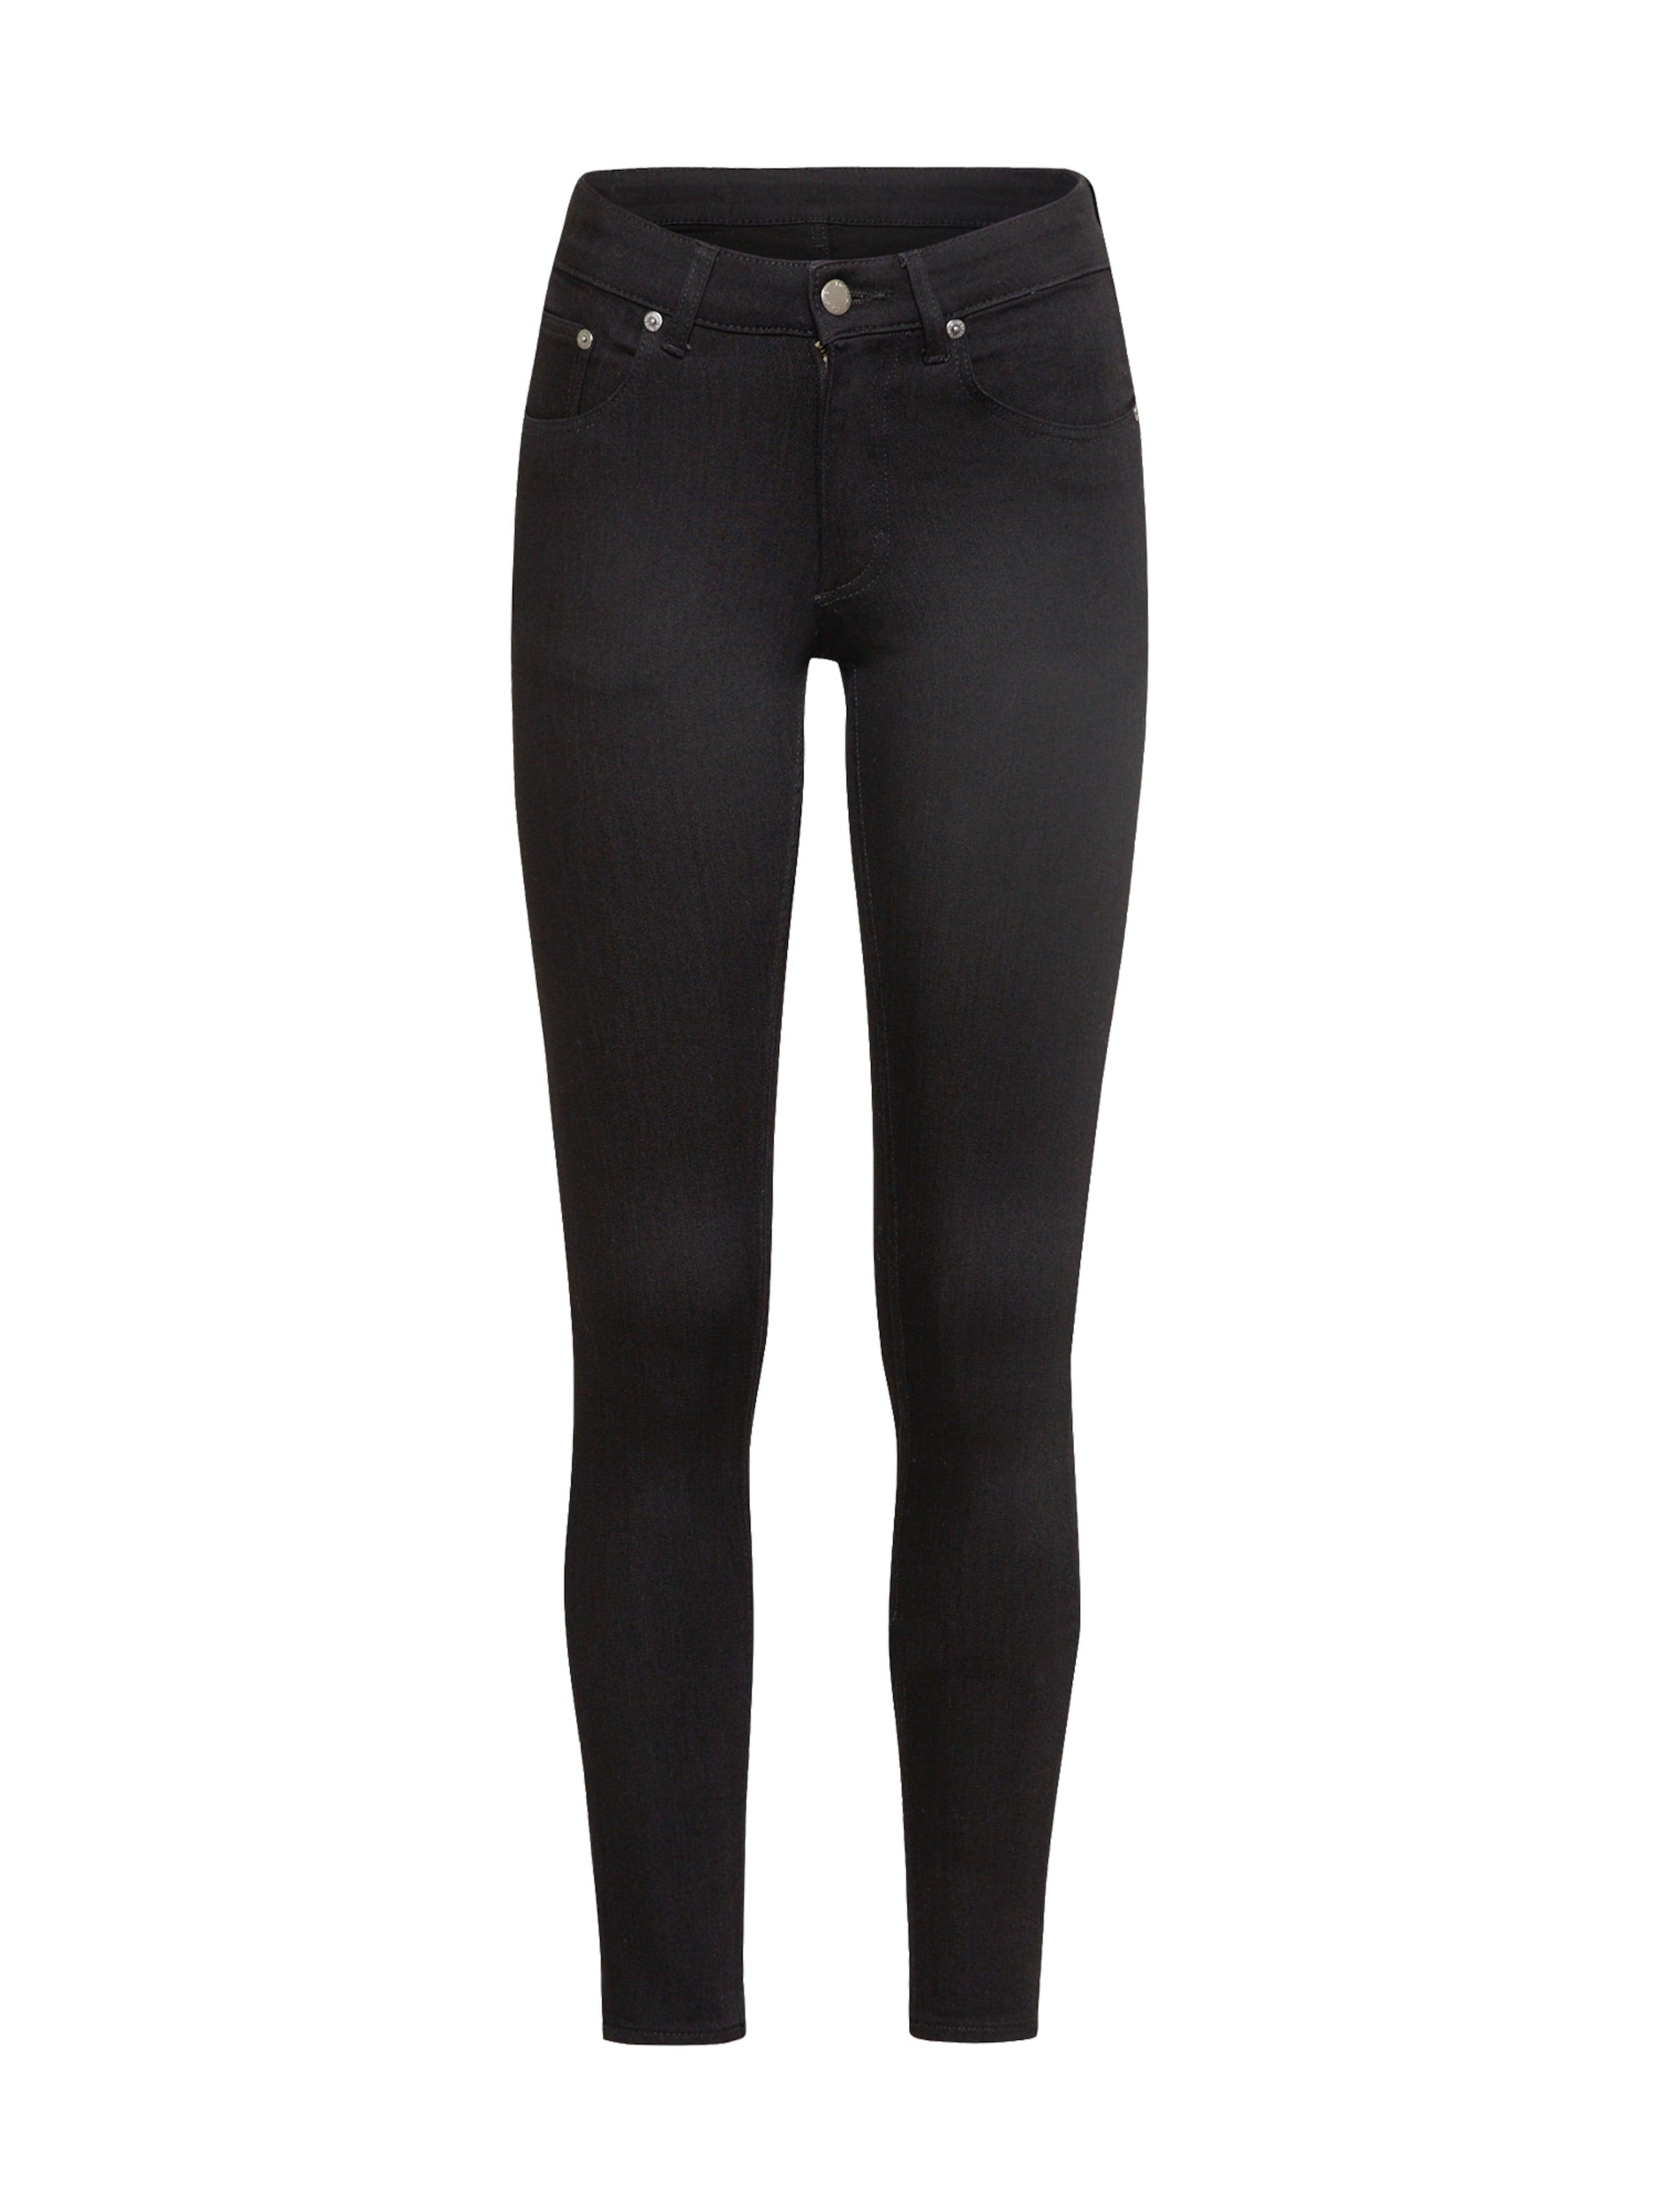 Jeans Schwarz Skinny 'mid In Monday Cheap Skin' 0kOPwXn8